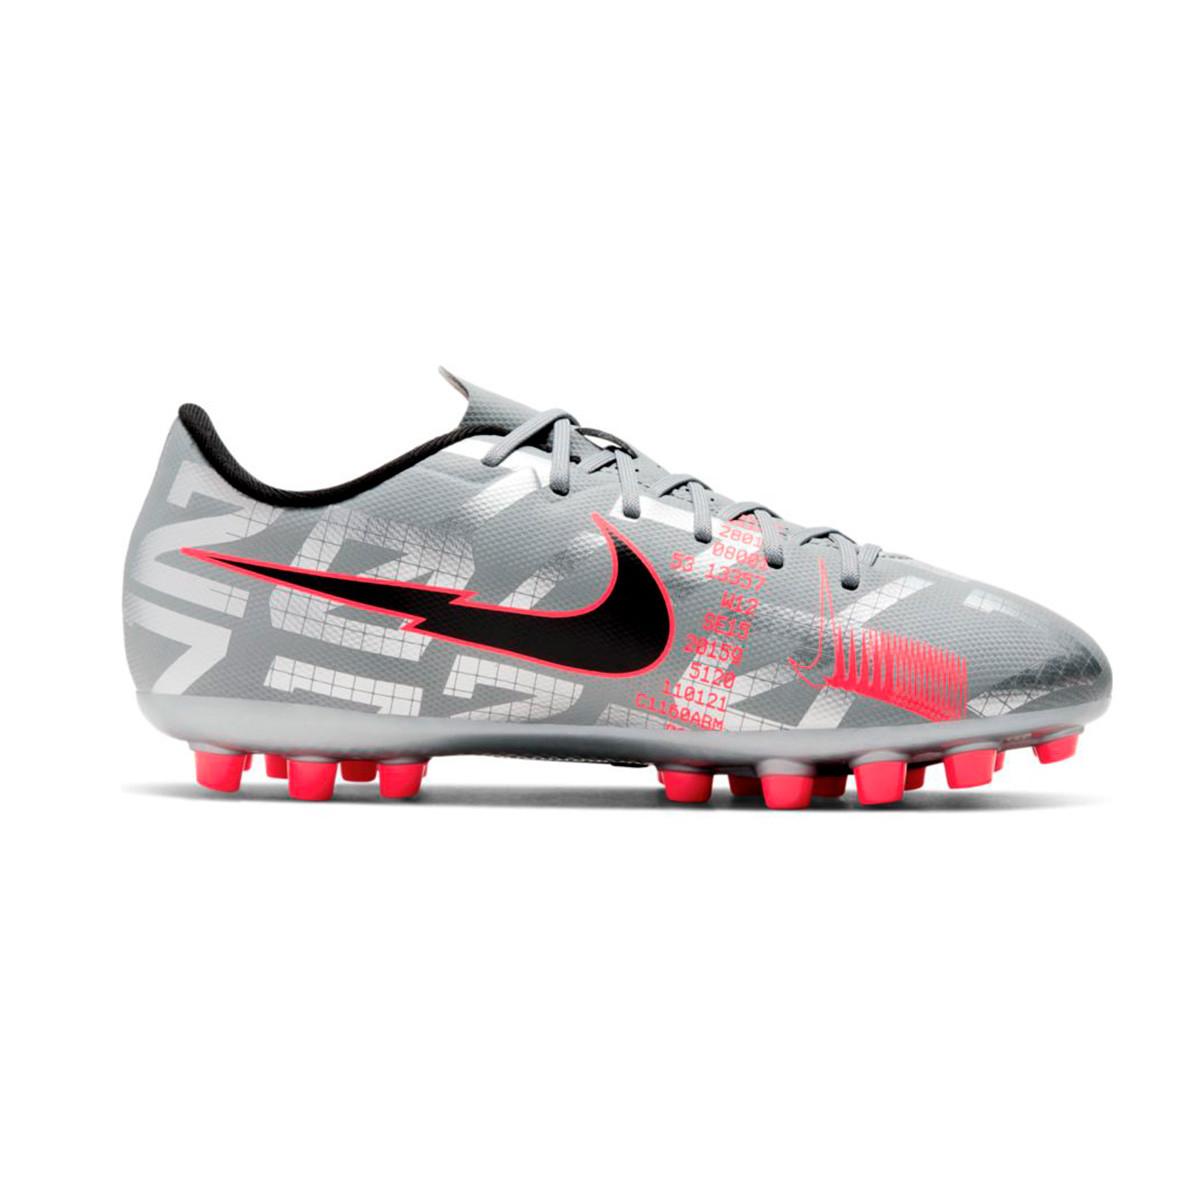 Chaussure de foot Nike Mercurial Vapor XIII Academy AG Niño